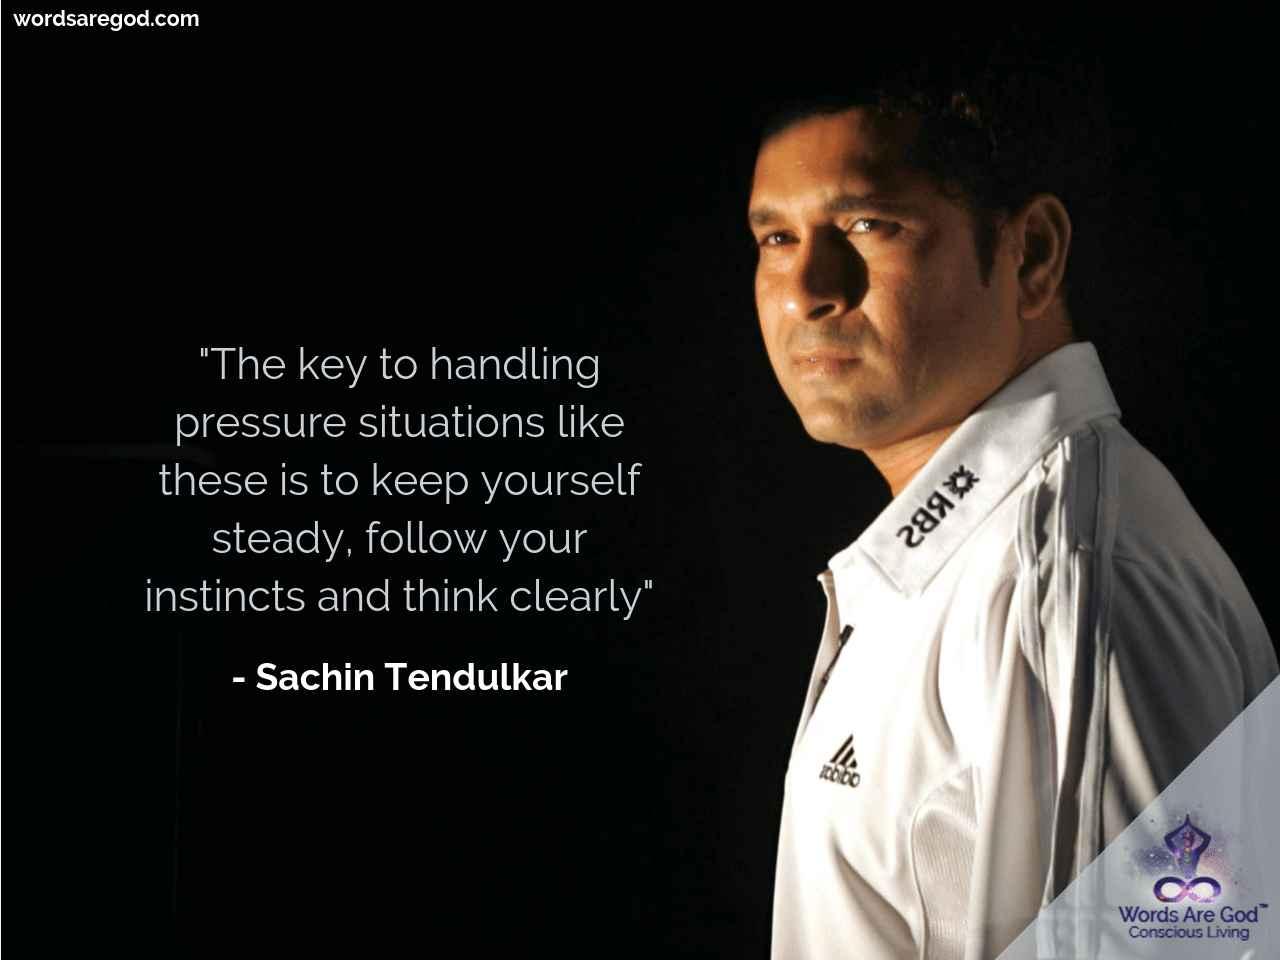 Sachin Tendulkar Motivational Quote by Sachin Tendulkar